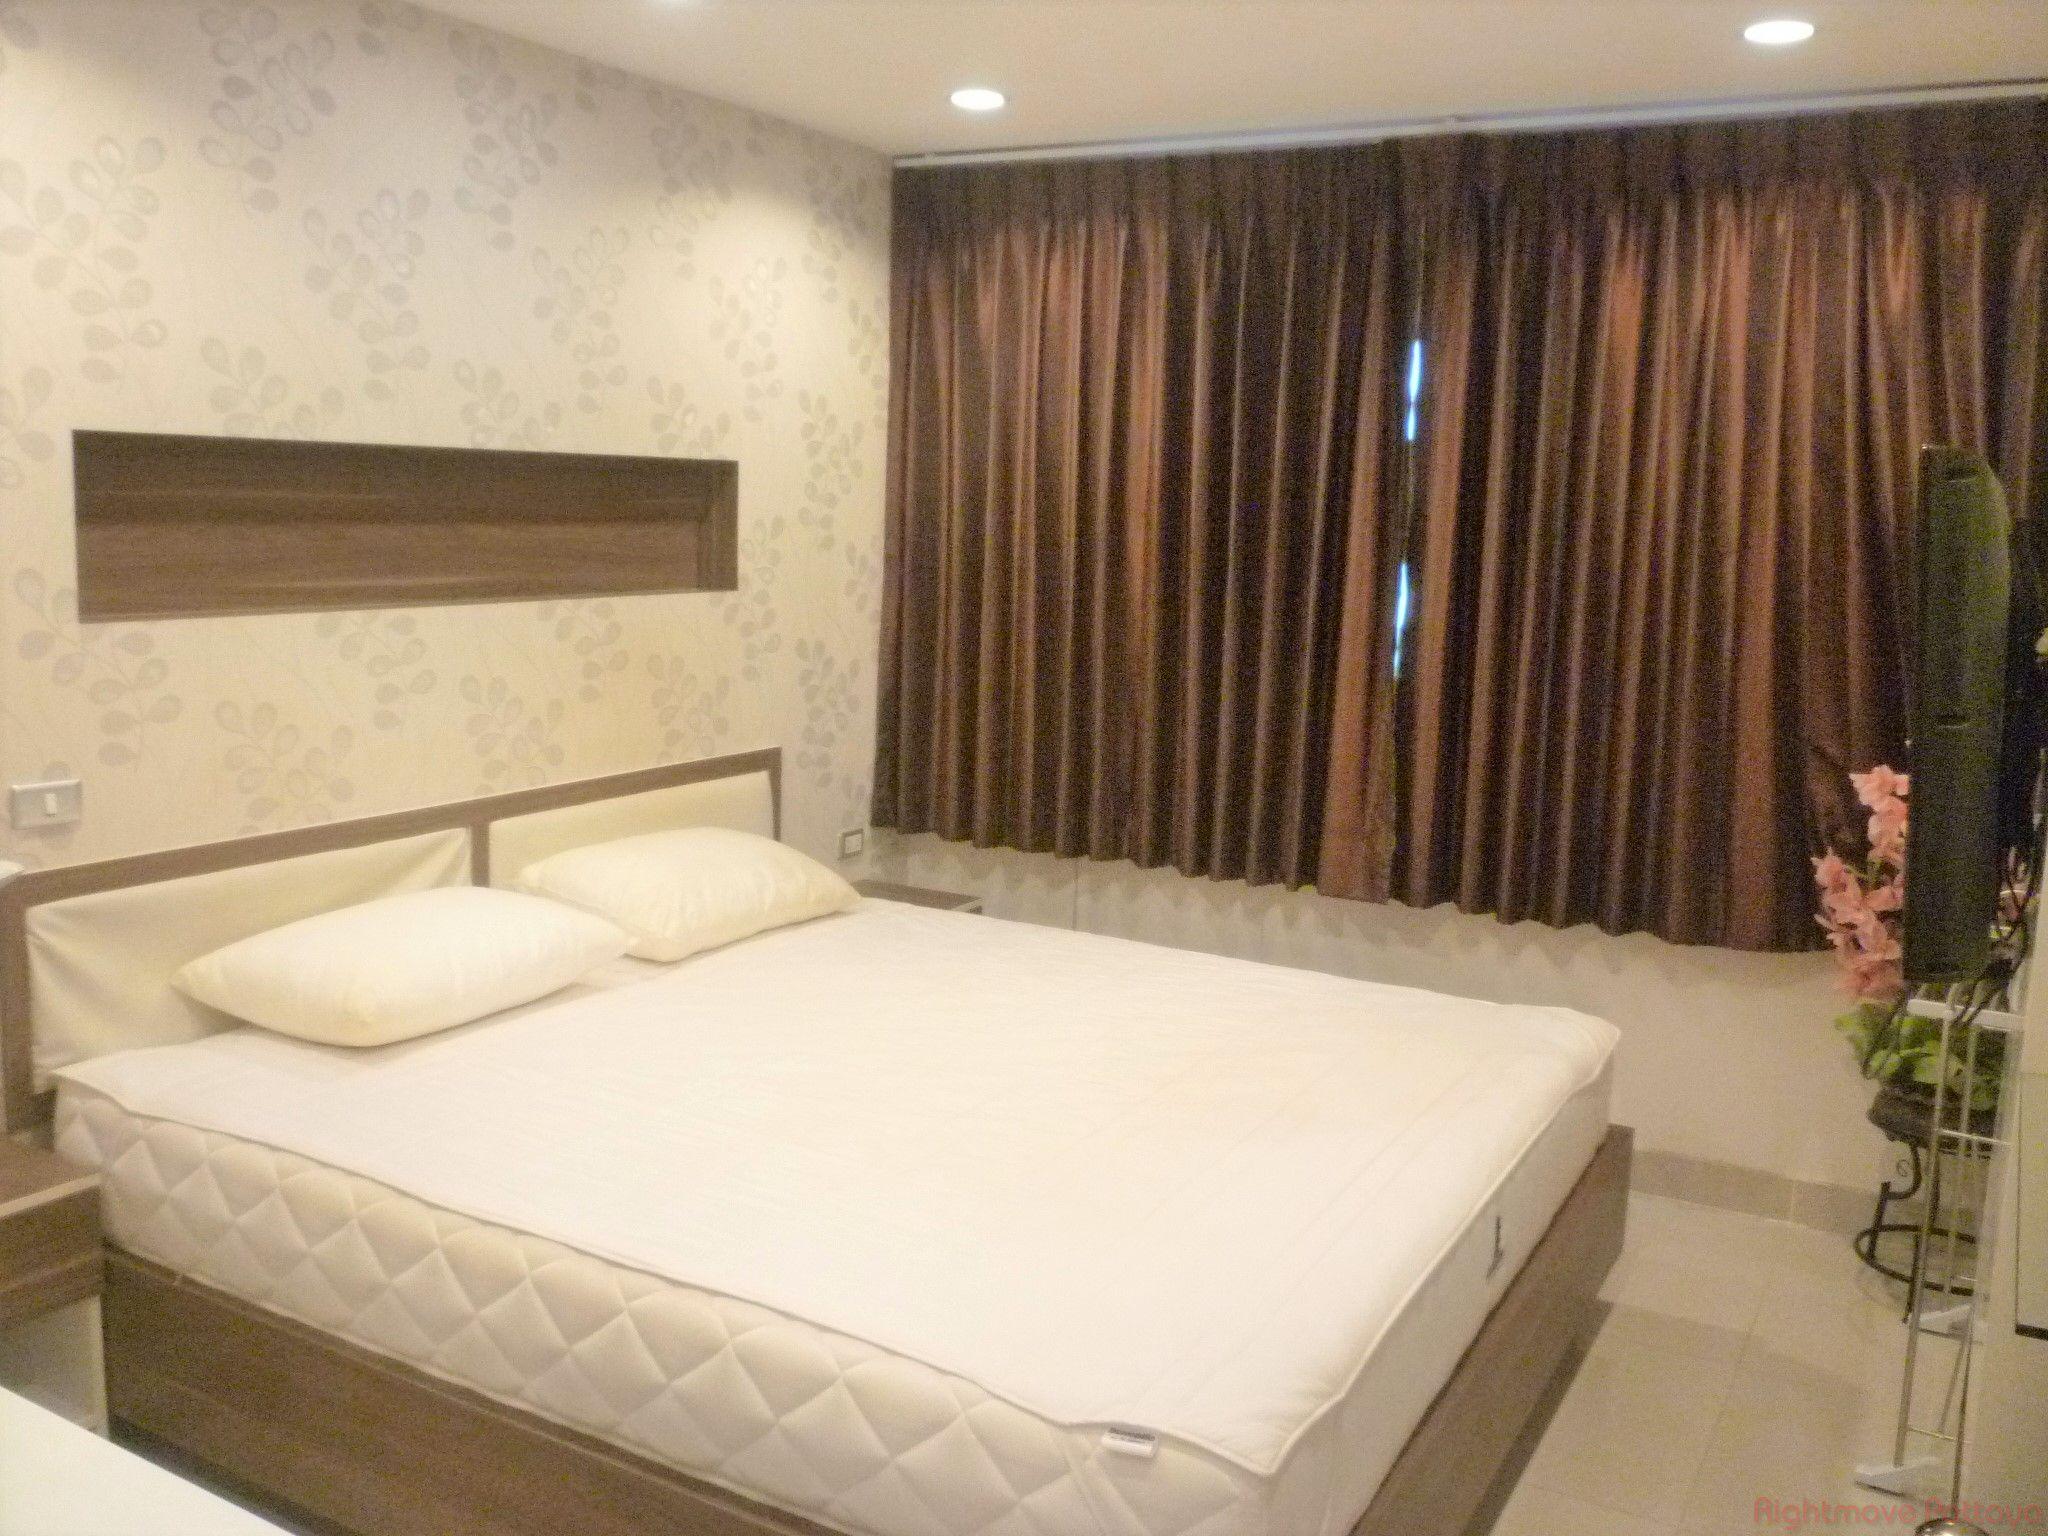 pic-7-Rightmove Pattaya Porchland 2 Jomtien Resort Condominiums for sale in Jomtien Pattaya